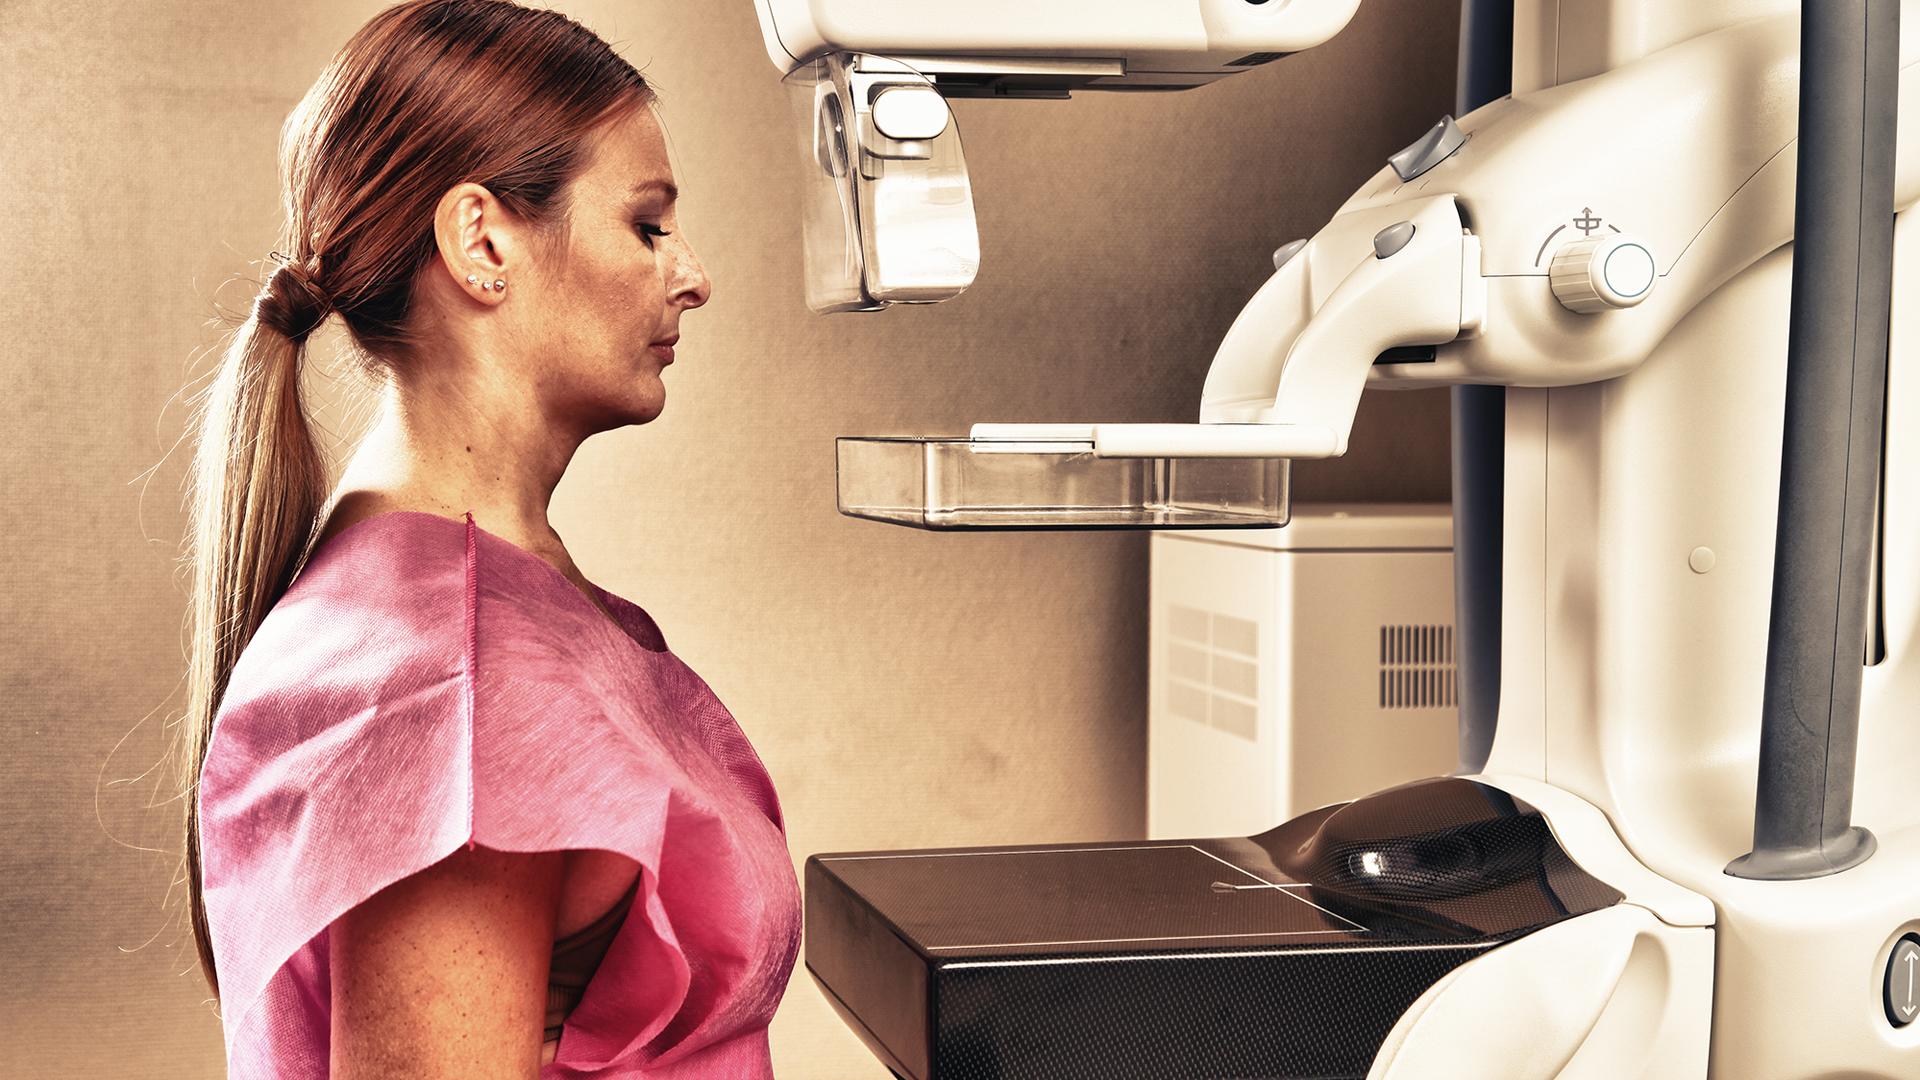 02.Mammograms 101